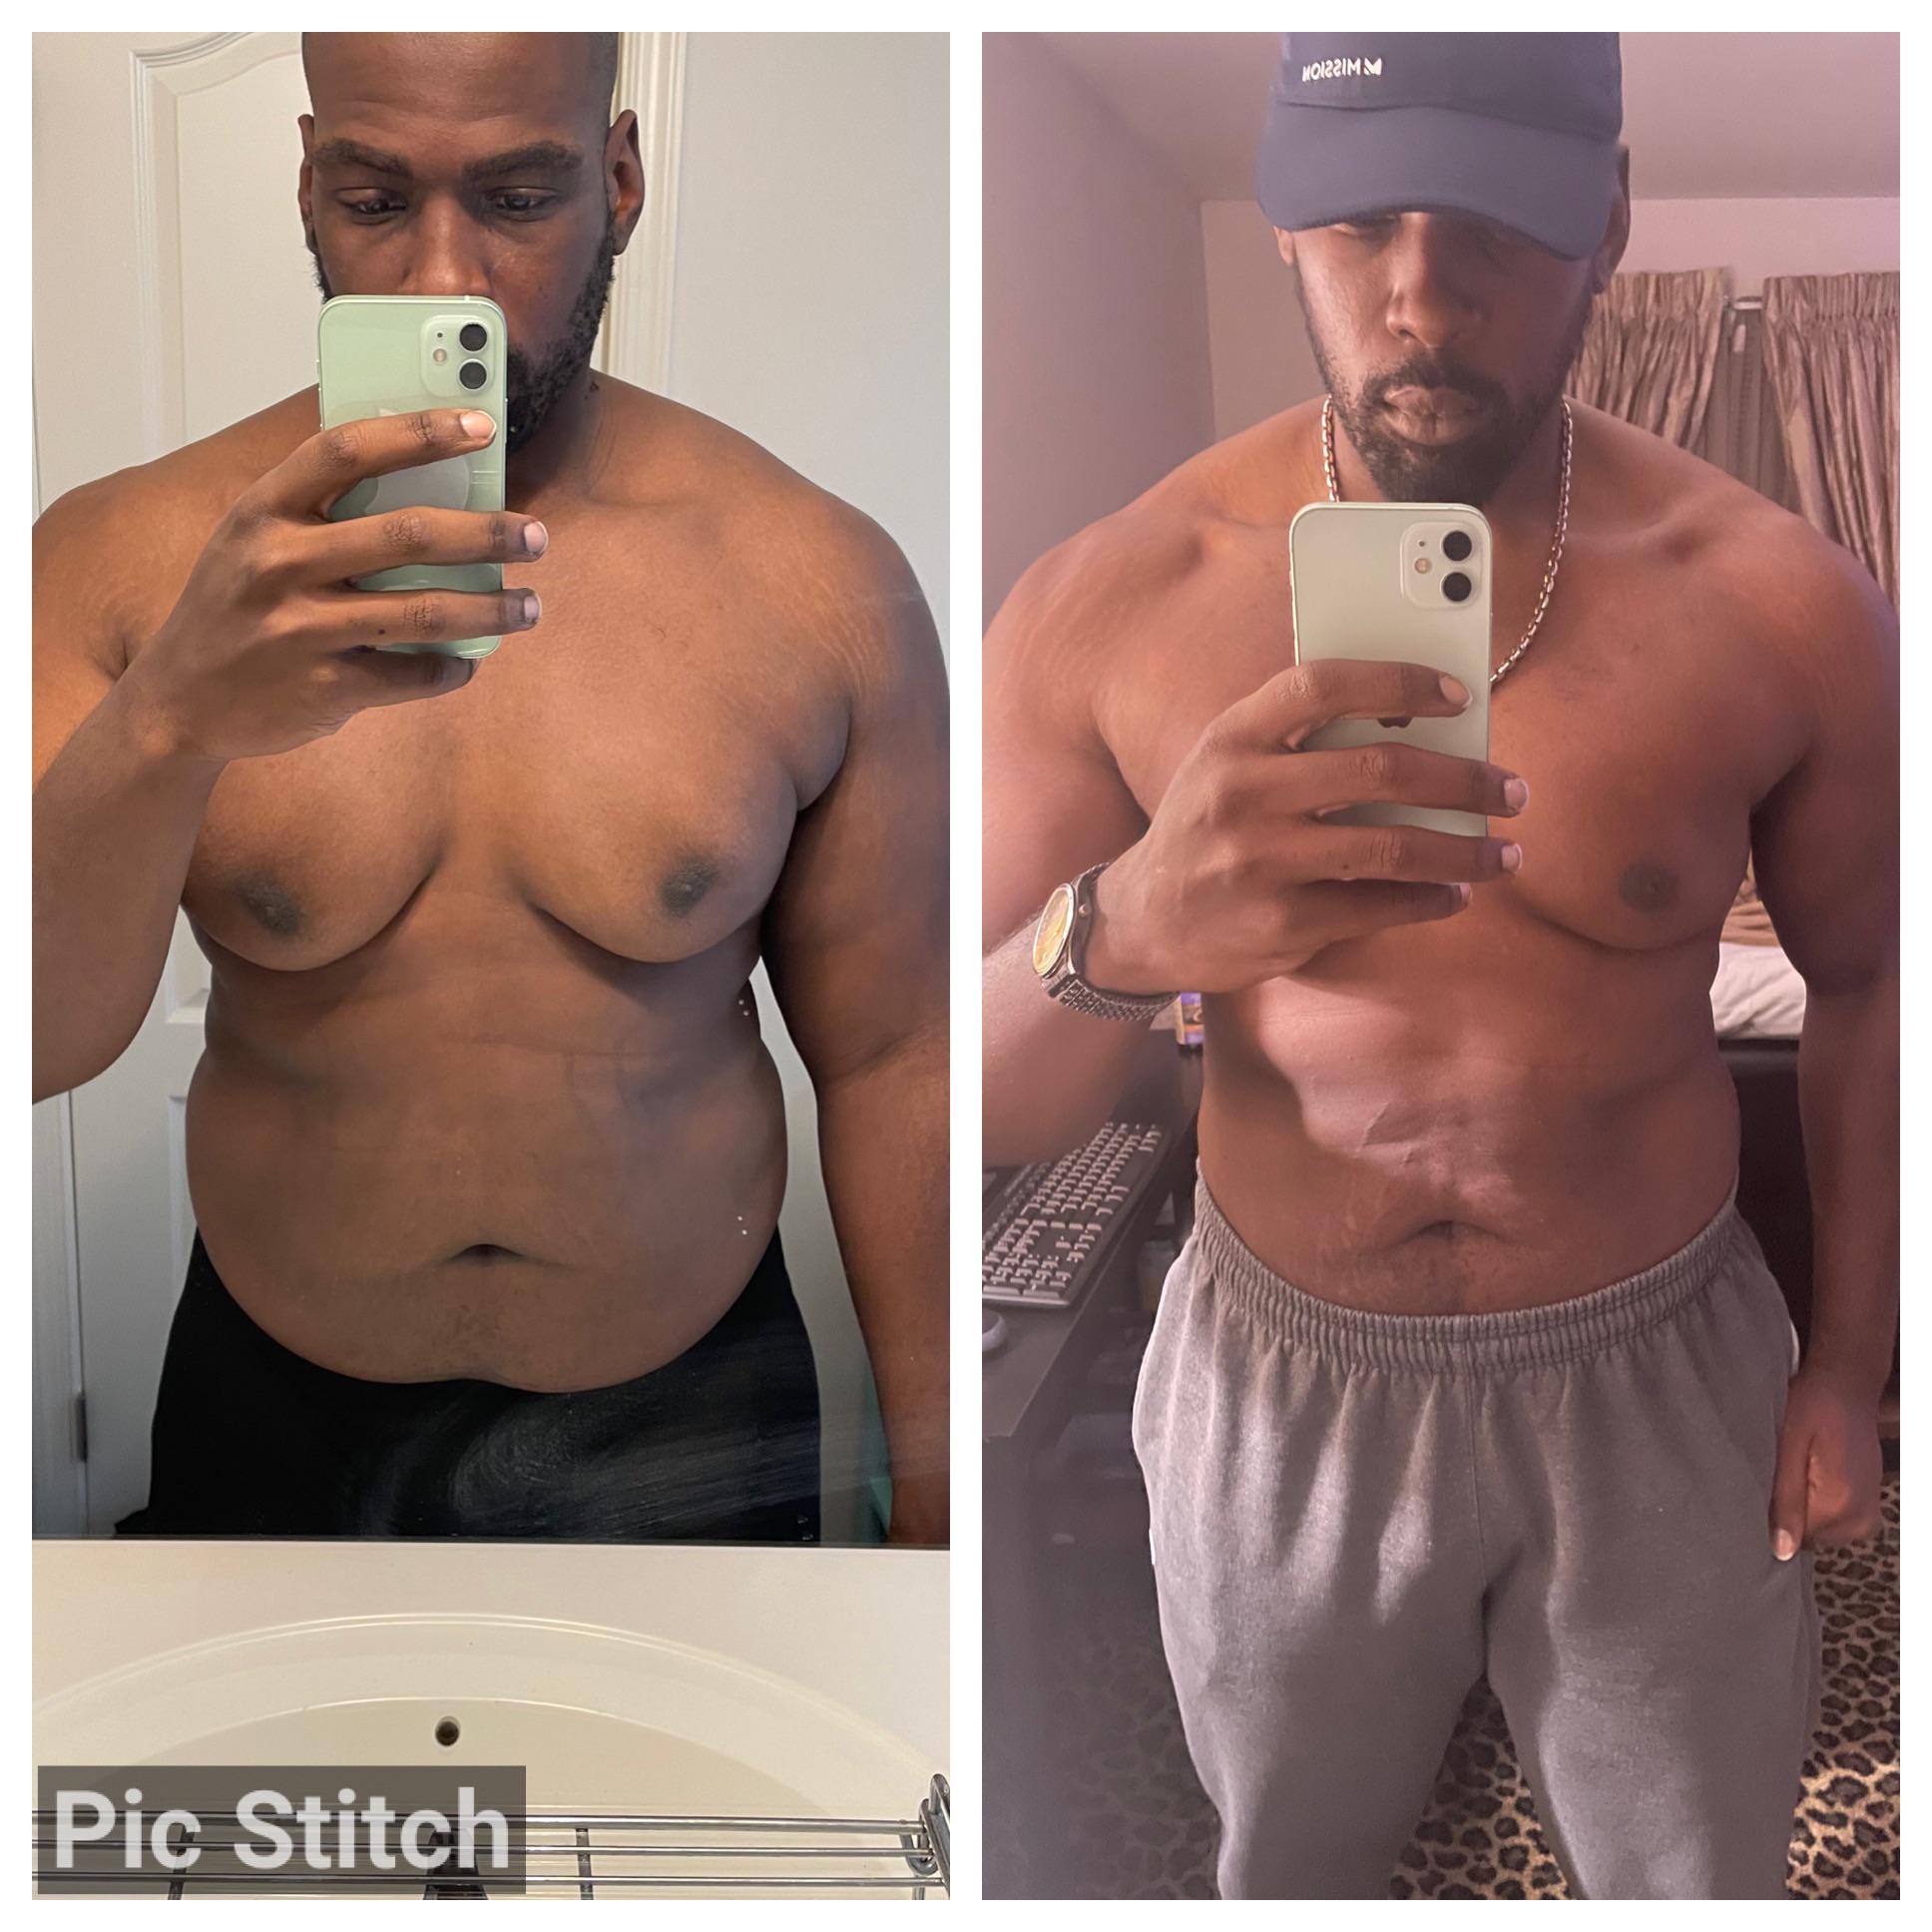 6 foot Male Progress Pics of 32 lbs Weight Loss 280 lbs to 248 lbs